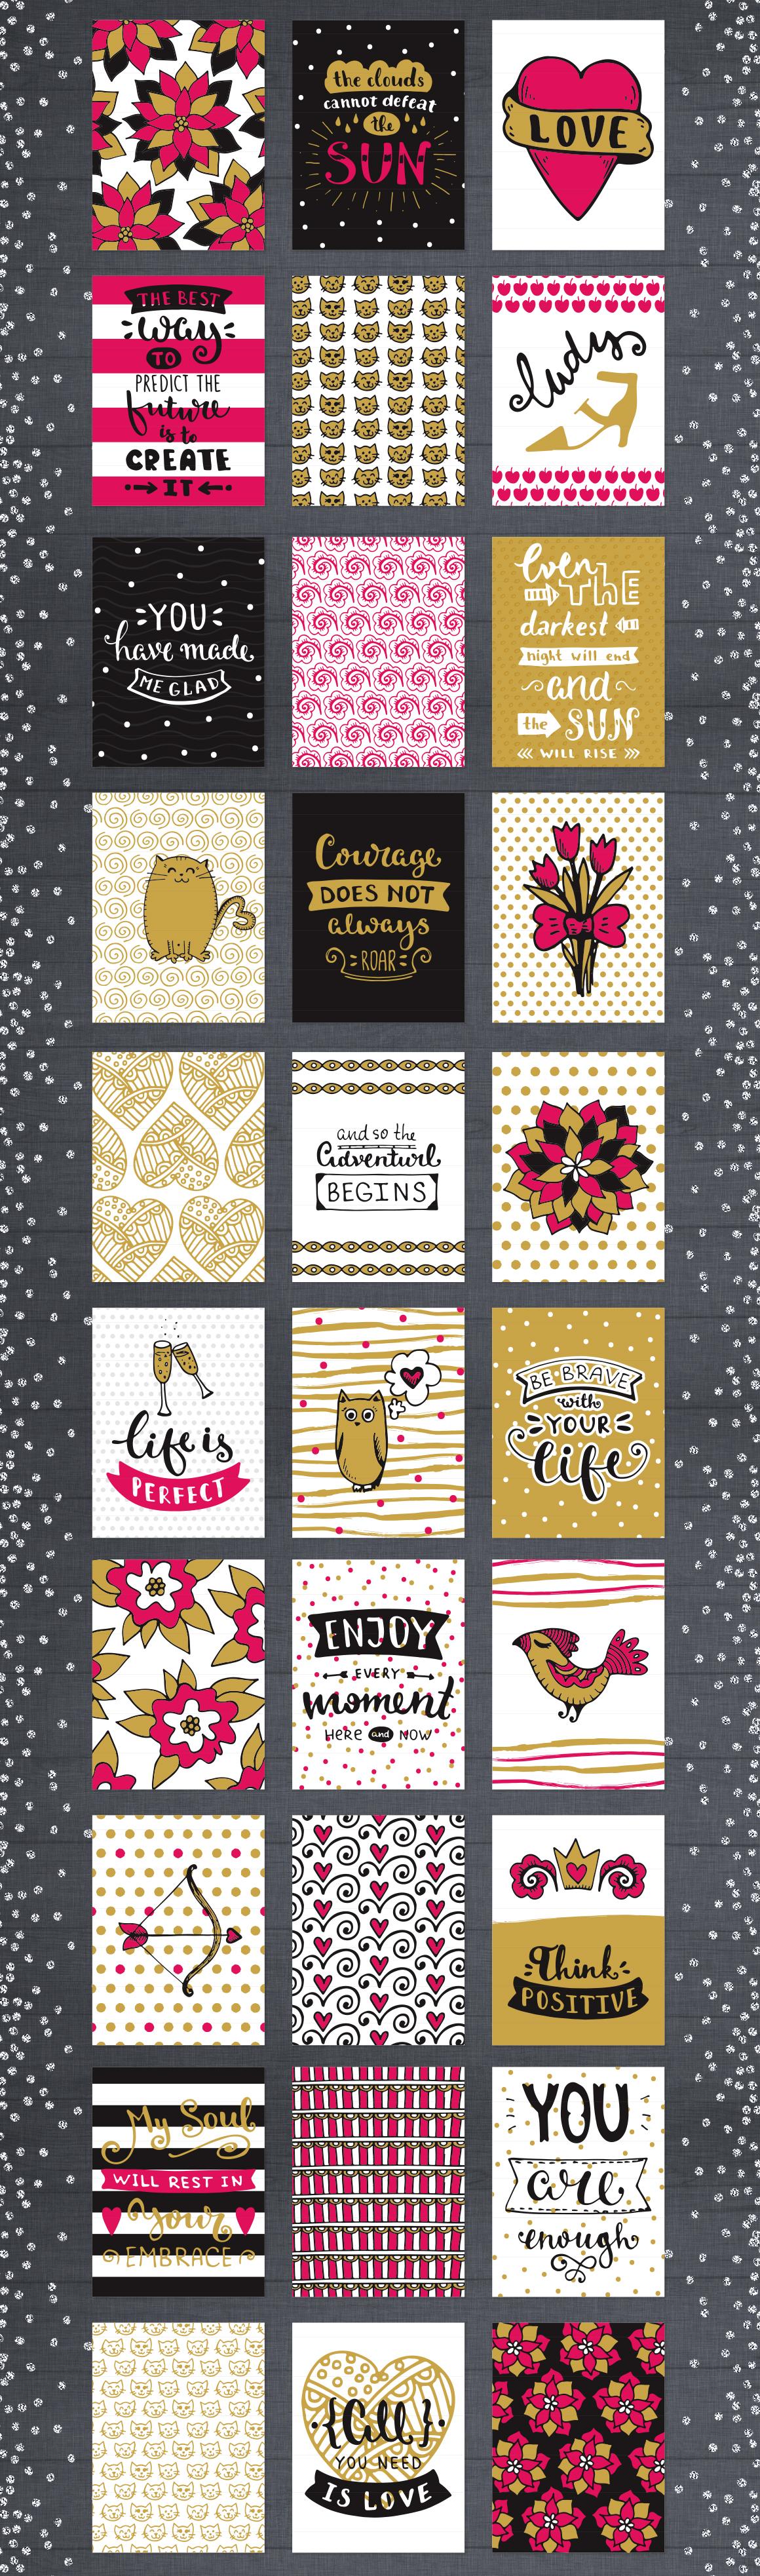 60 Valentine's Day Romantic Cards #2 example image 2